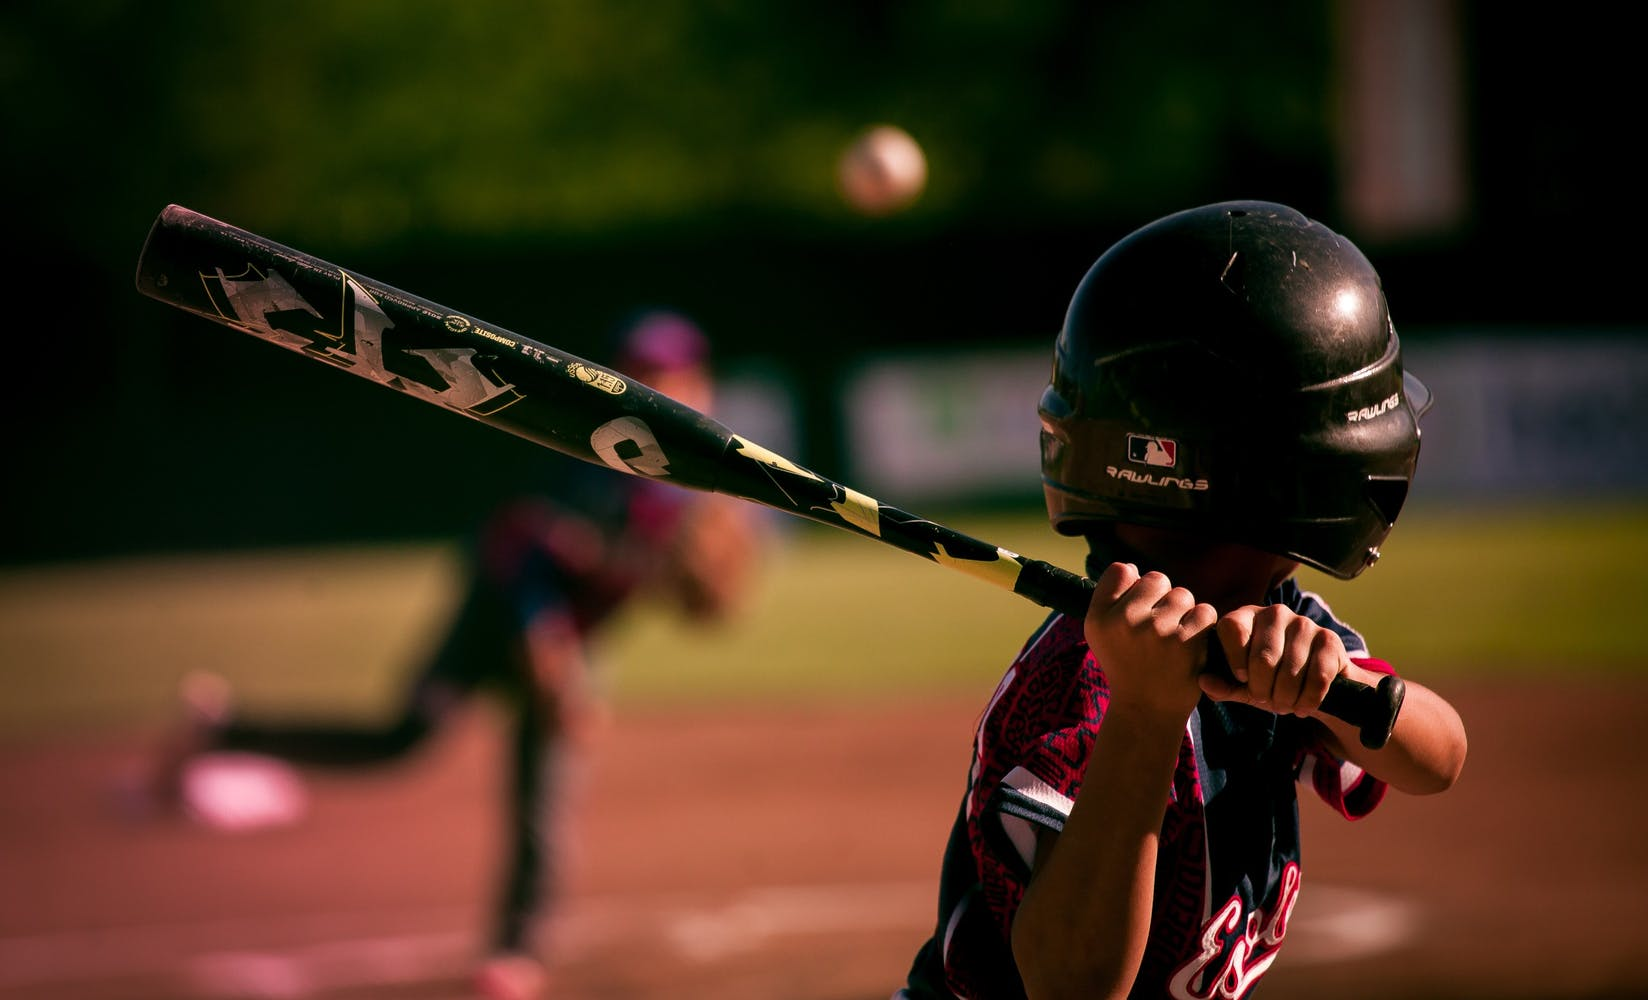 Flipgive easton baseball bat picks